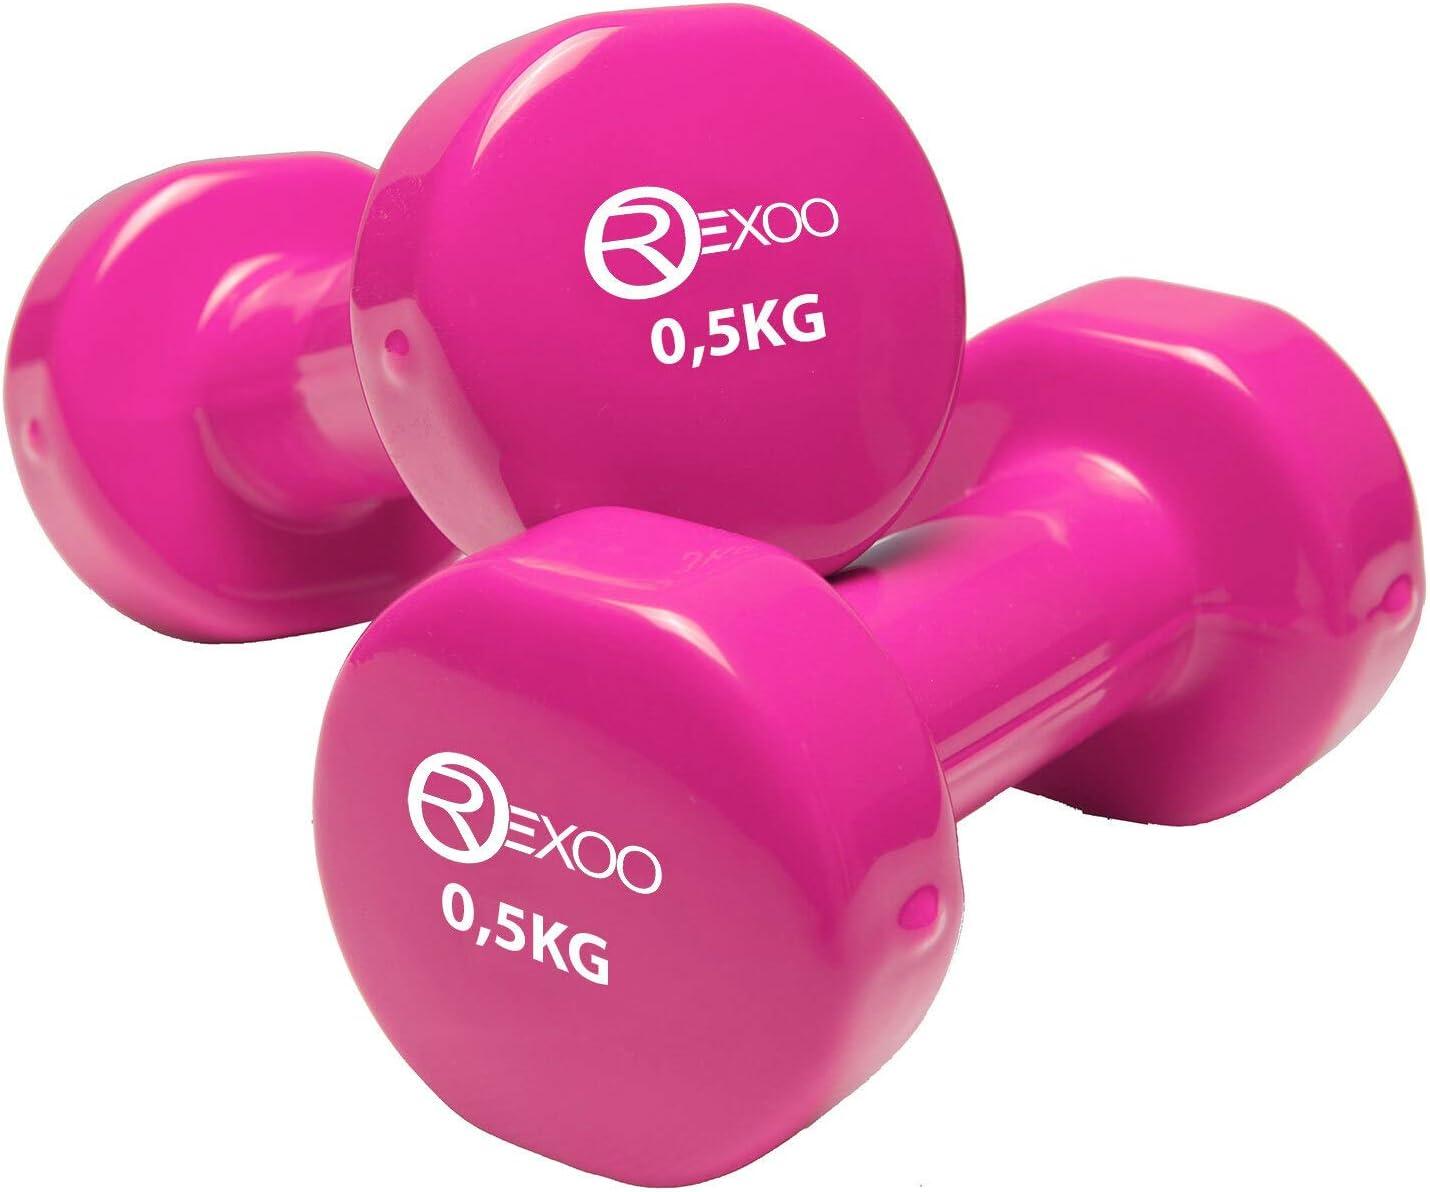 Gewichte 2er Set 2X 0,5kg bis 2X 5,0kg REXOO Vinyl Hanteln Kurzhanteln Gymnastikhantel